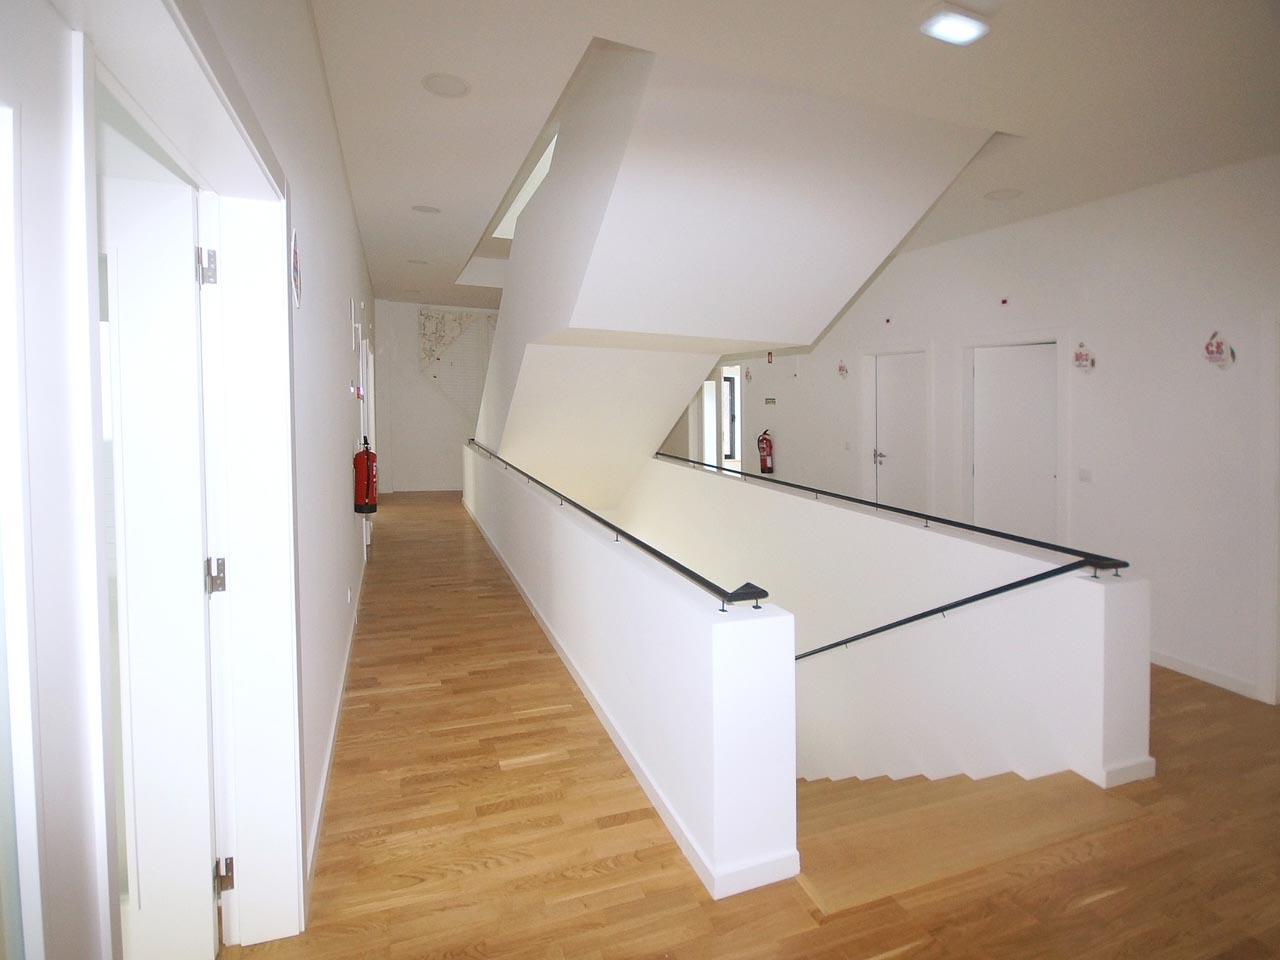 https://www.araujo-arquitectura.pt/wp-content/uploads/2021/01/08.jpg